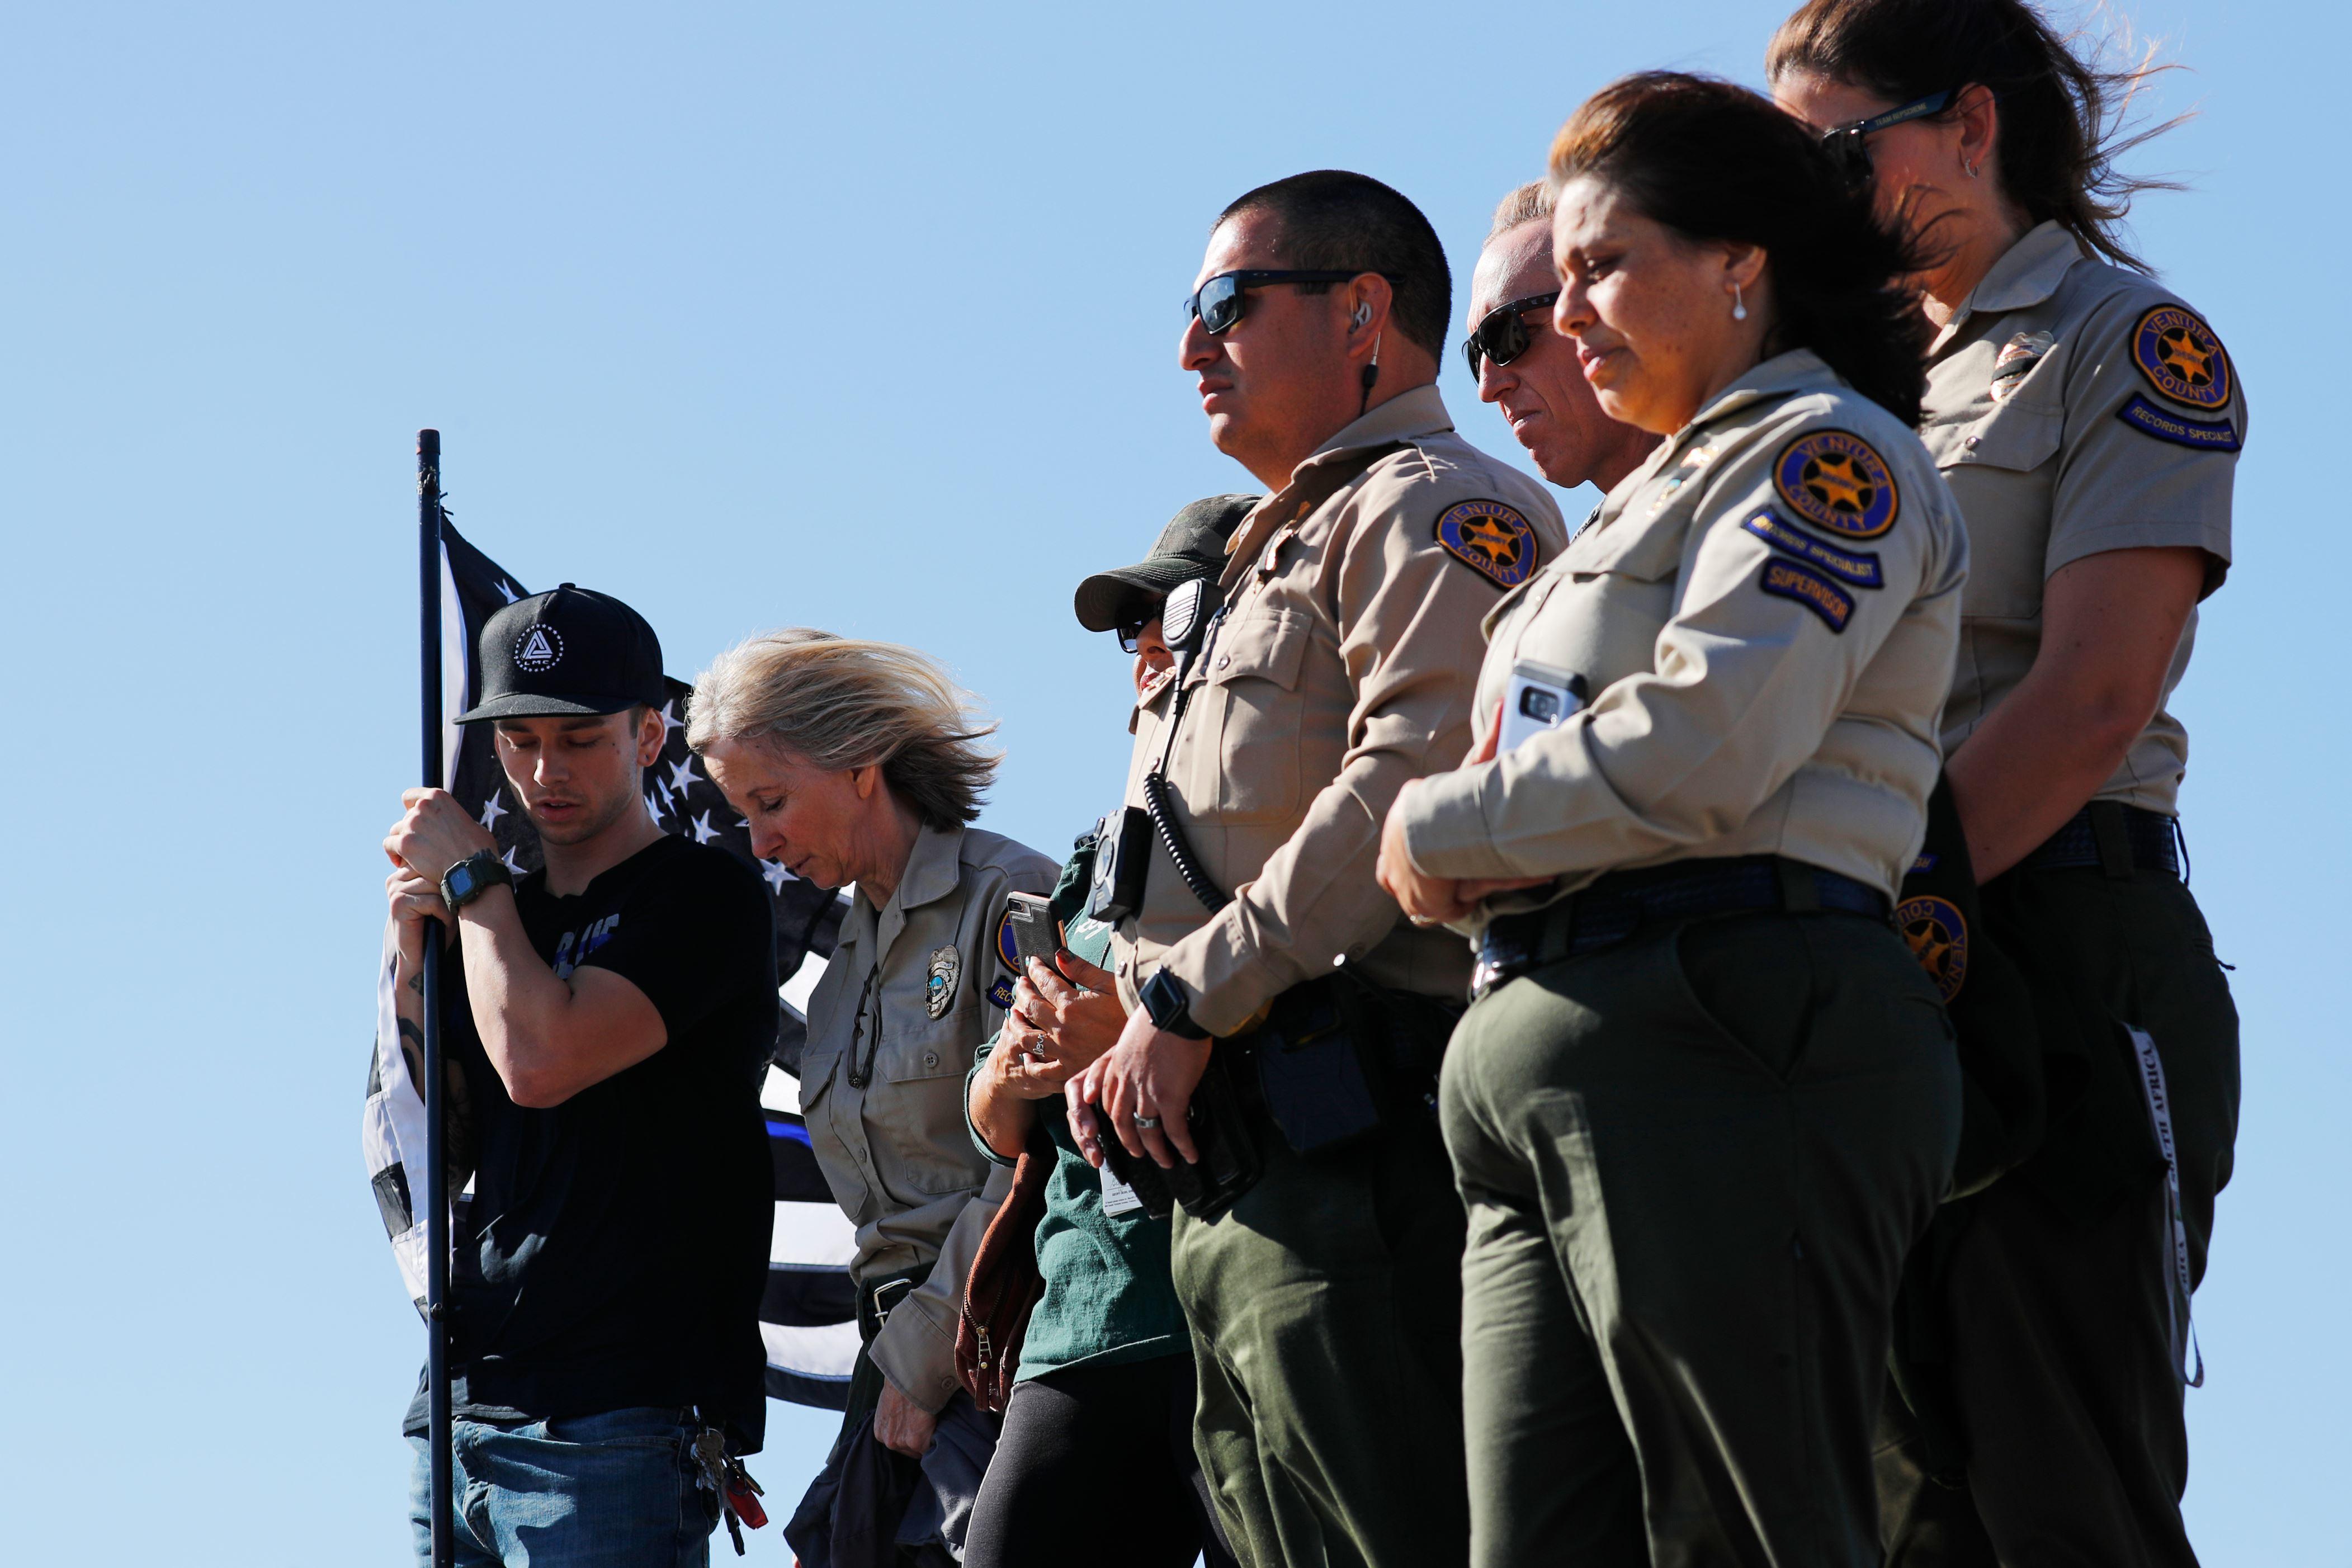 Transgender vetura county sheriff